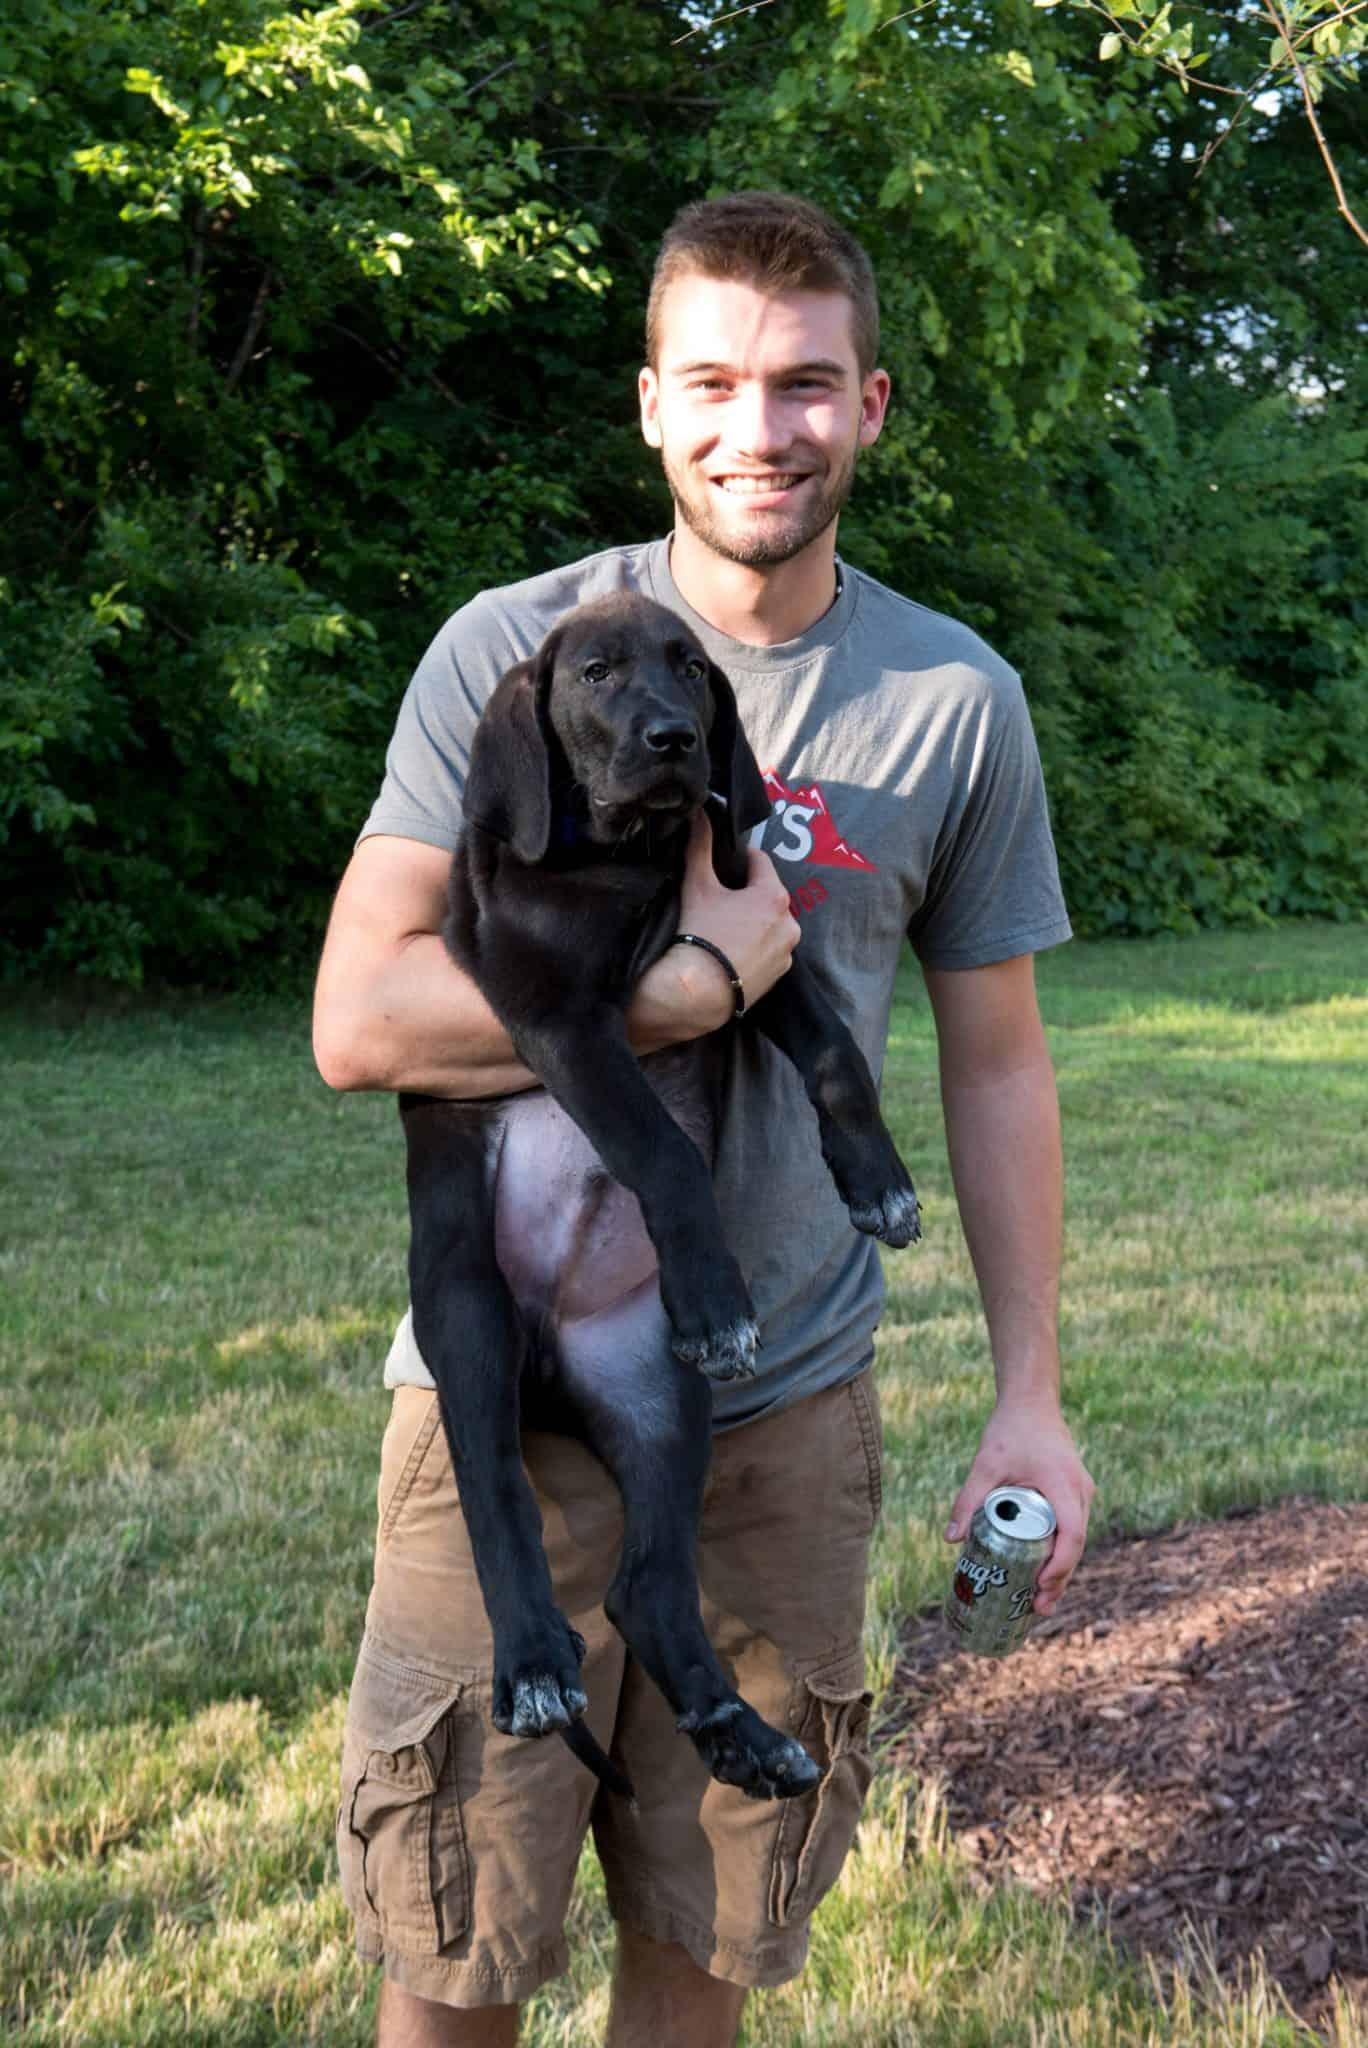 Apex employee holding Roman the black lab puppy